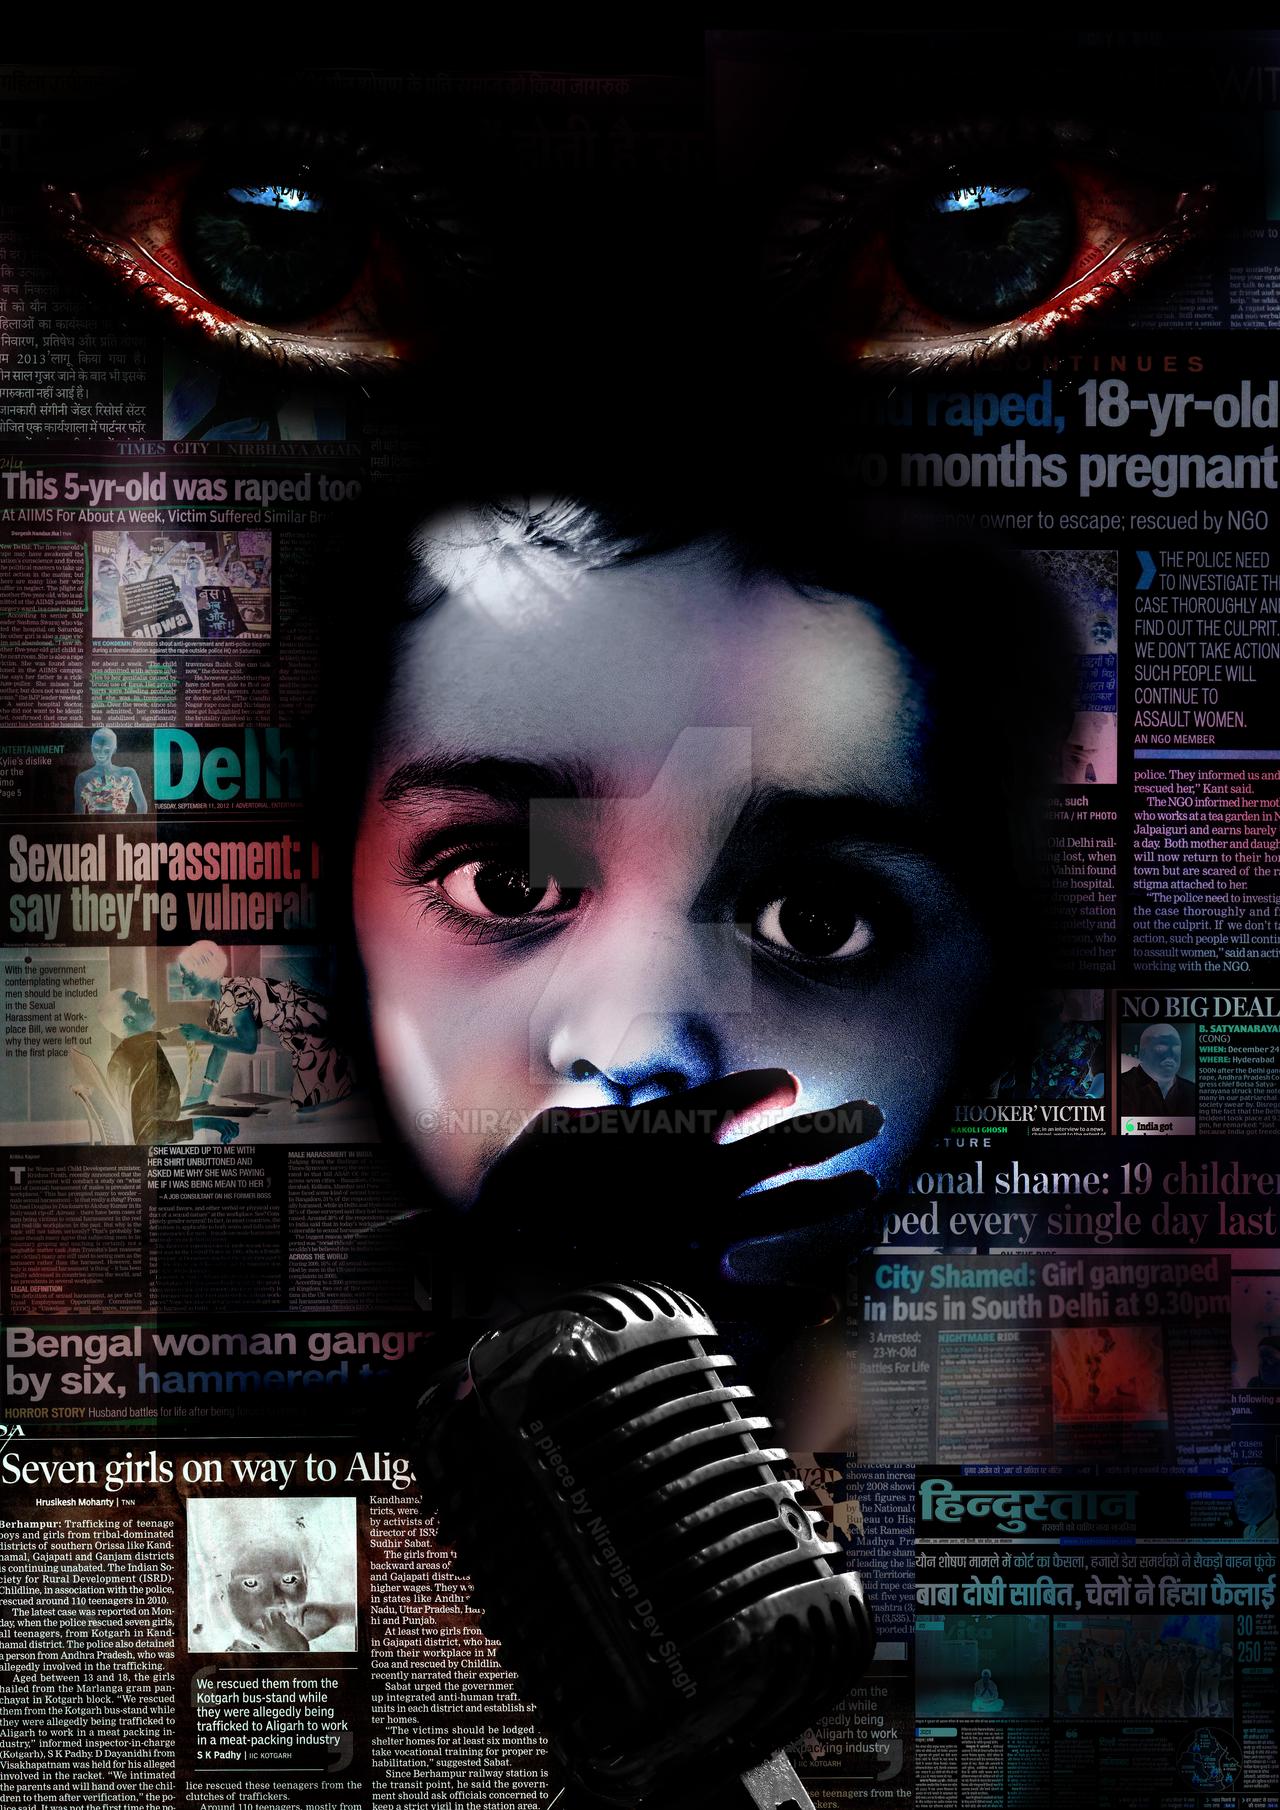 SPEECH | Poster on Rape by nir4vir on DeviantArt